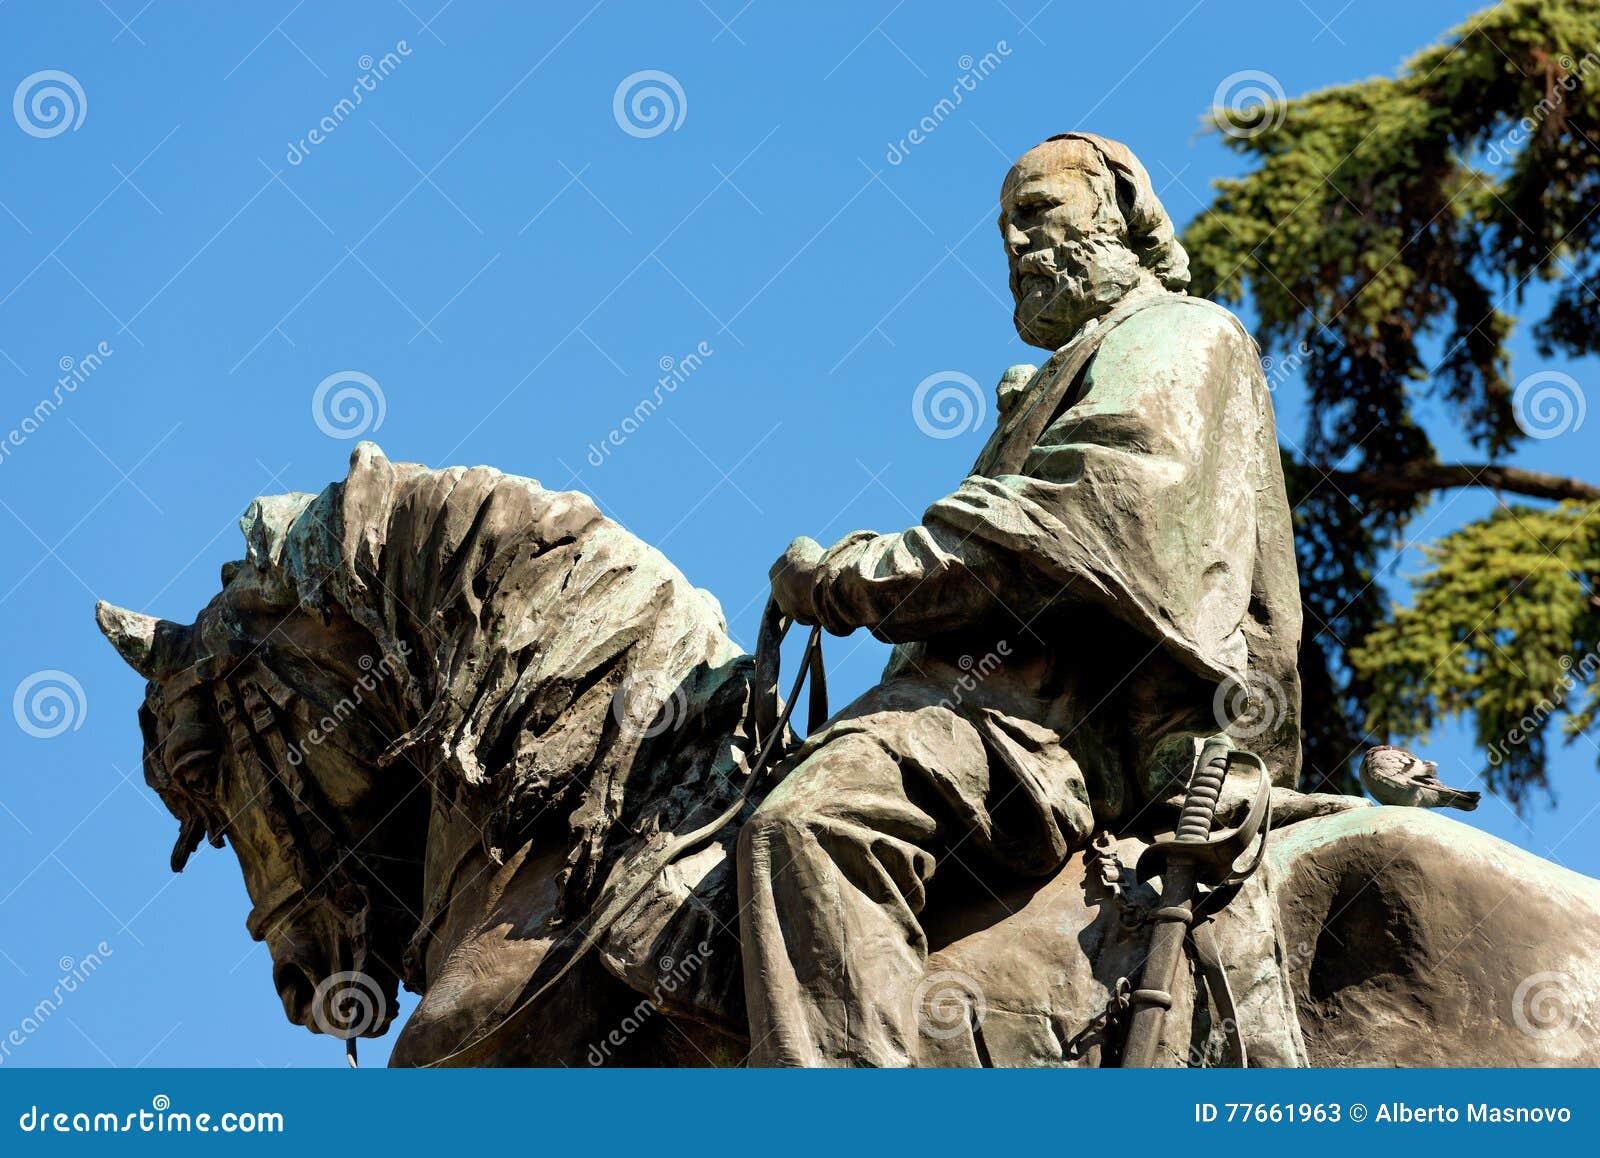 Standbeeld van Giuseppe Garibaldi - Verona Italy